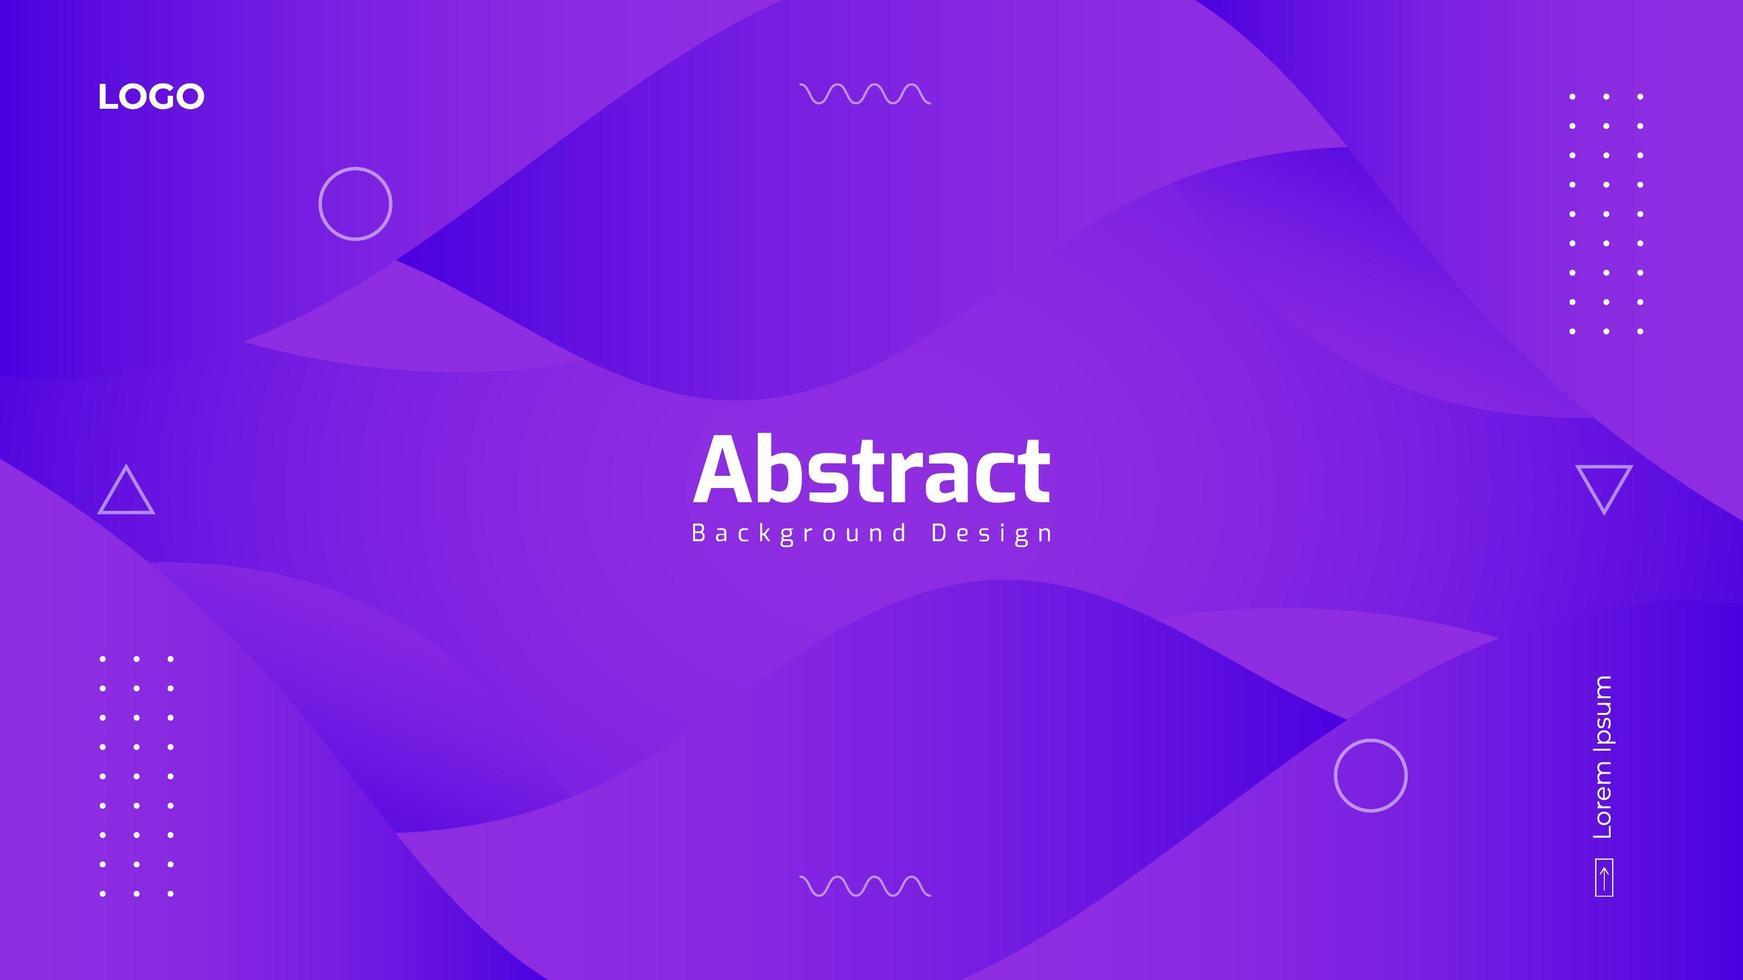 Gradient Purple Abstract Background Design vector